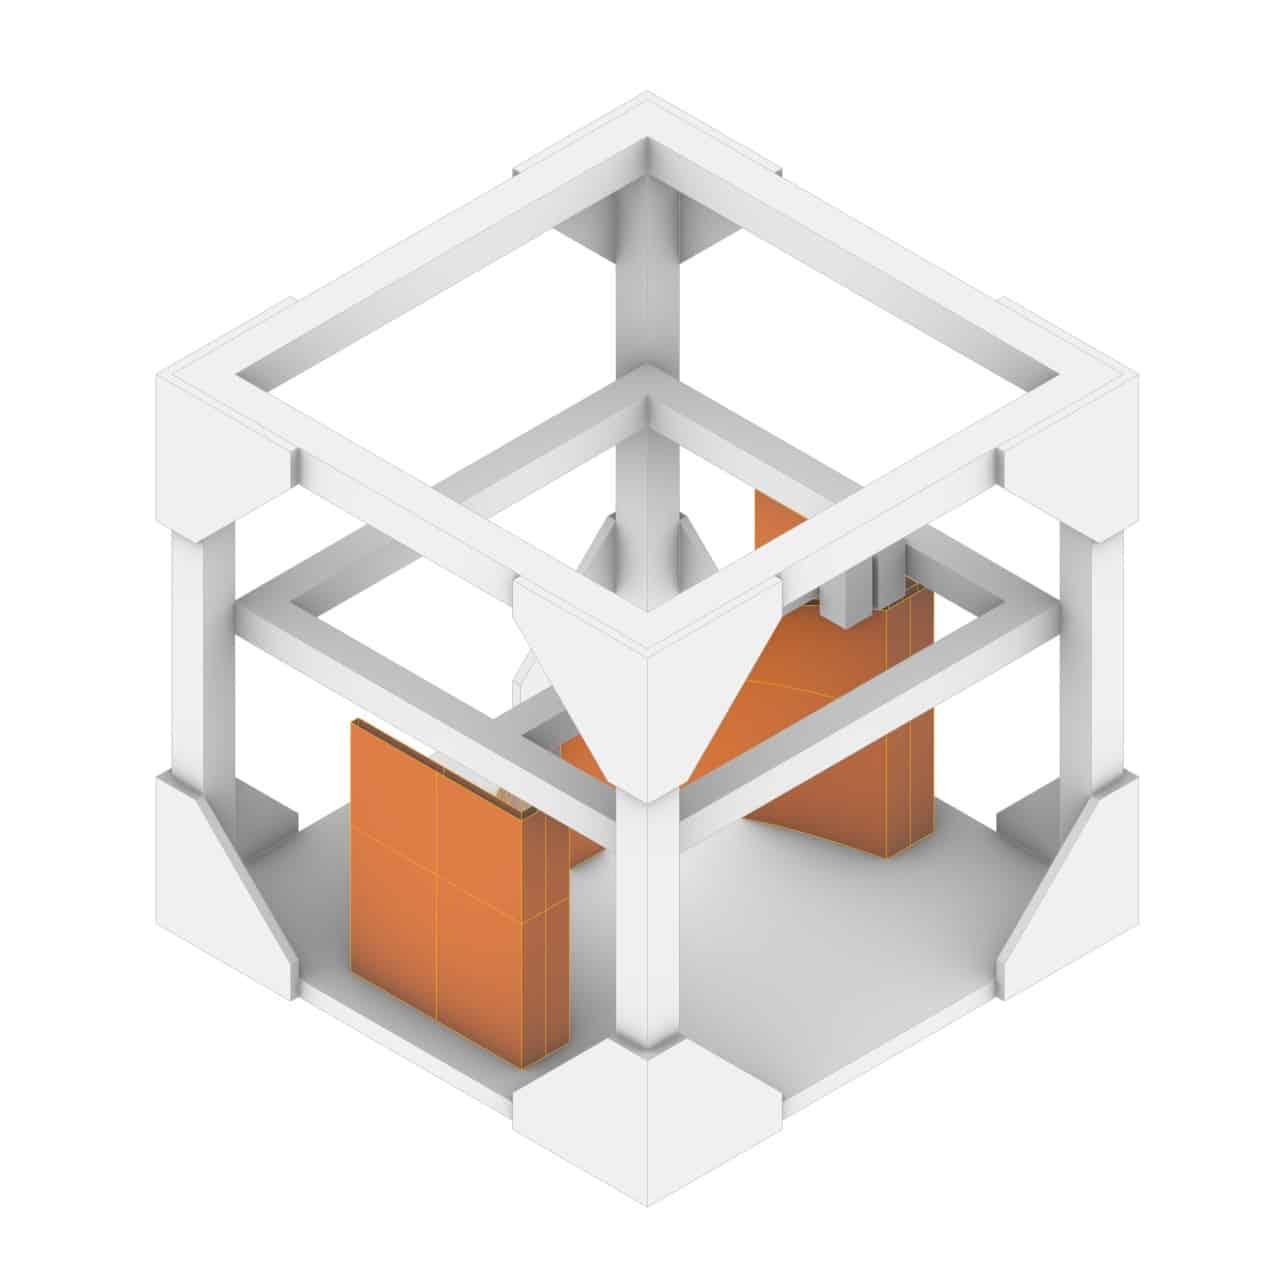 cfrp-3d-print-mold-step-1-print-mold